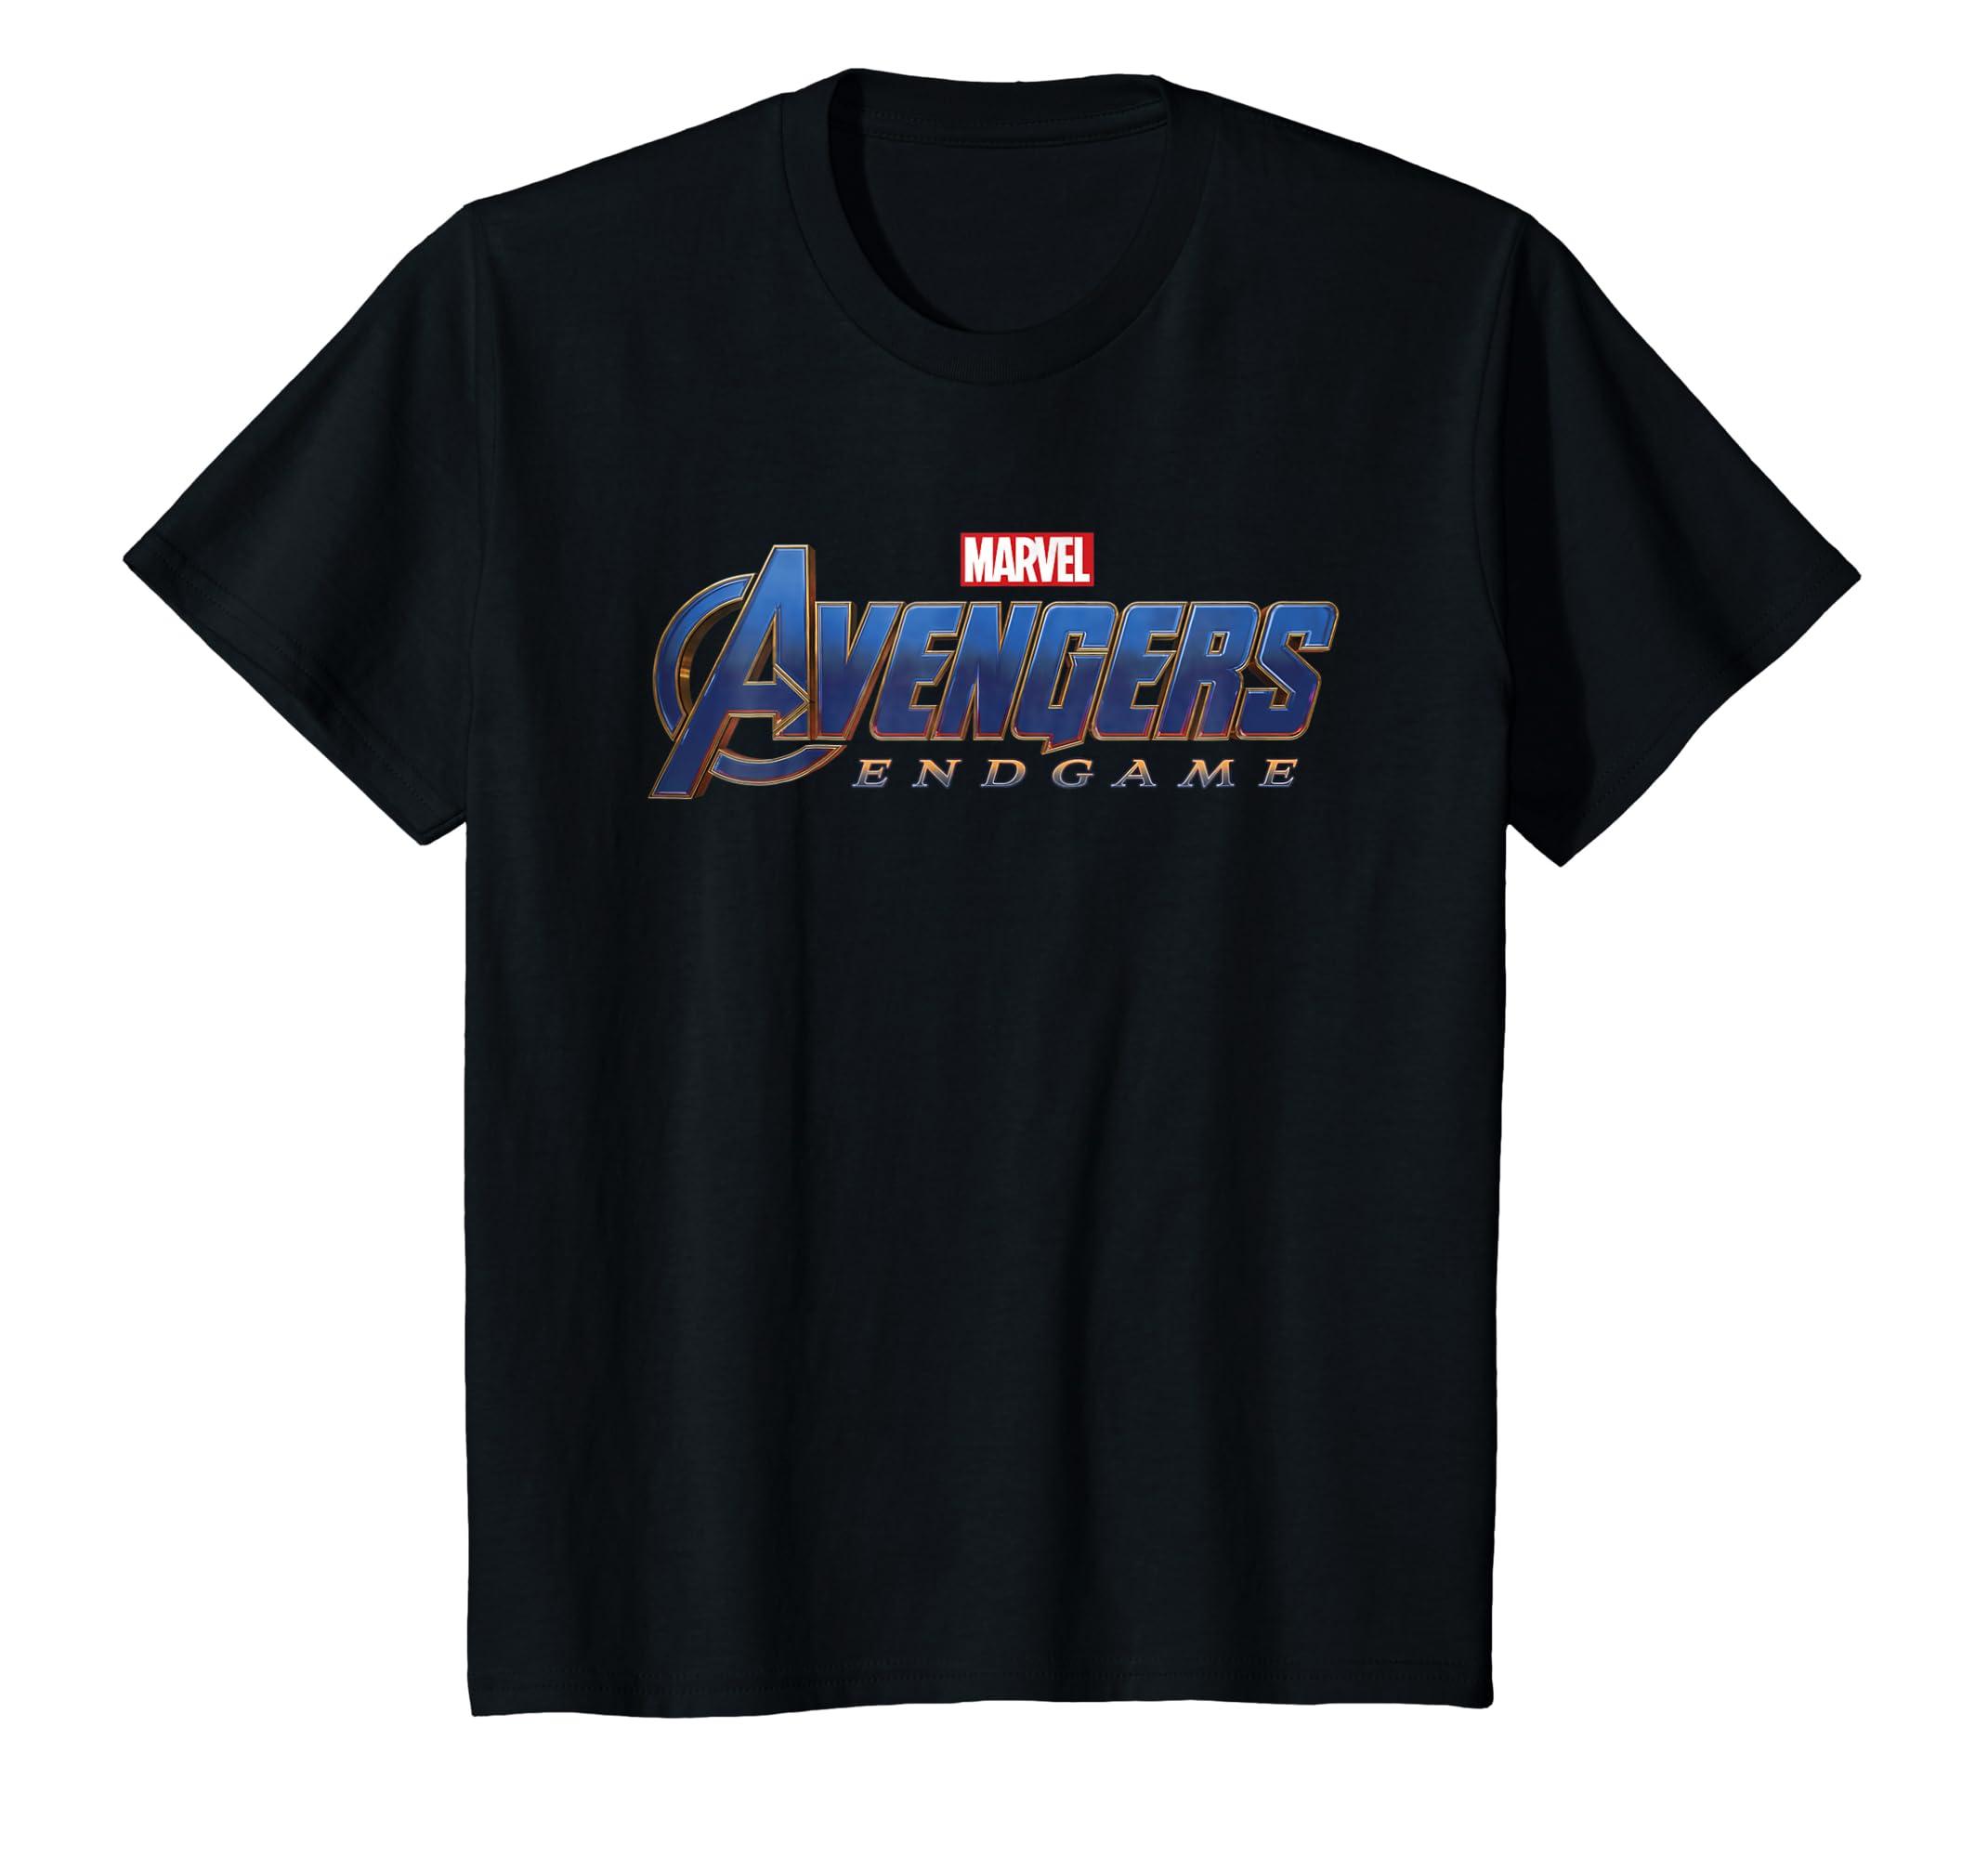 8c20d0db7de Amazon.com  Marvel Avengers Endgame Movie Logo Graphic T-Shirt  Clothing